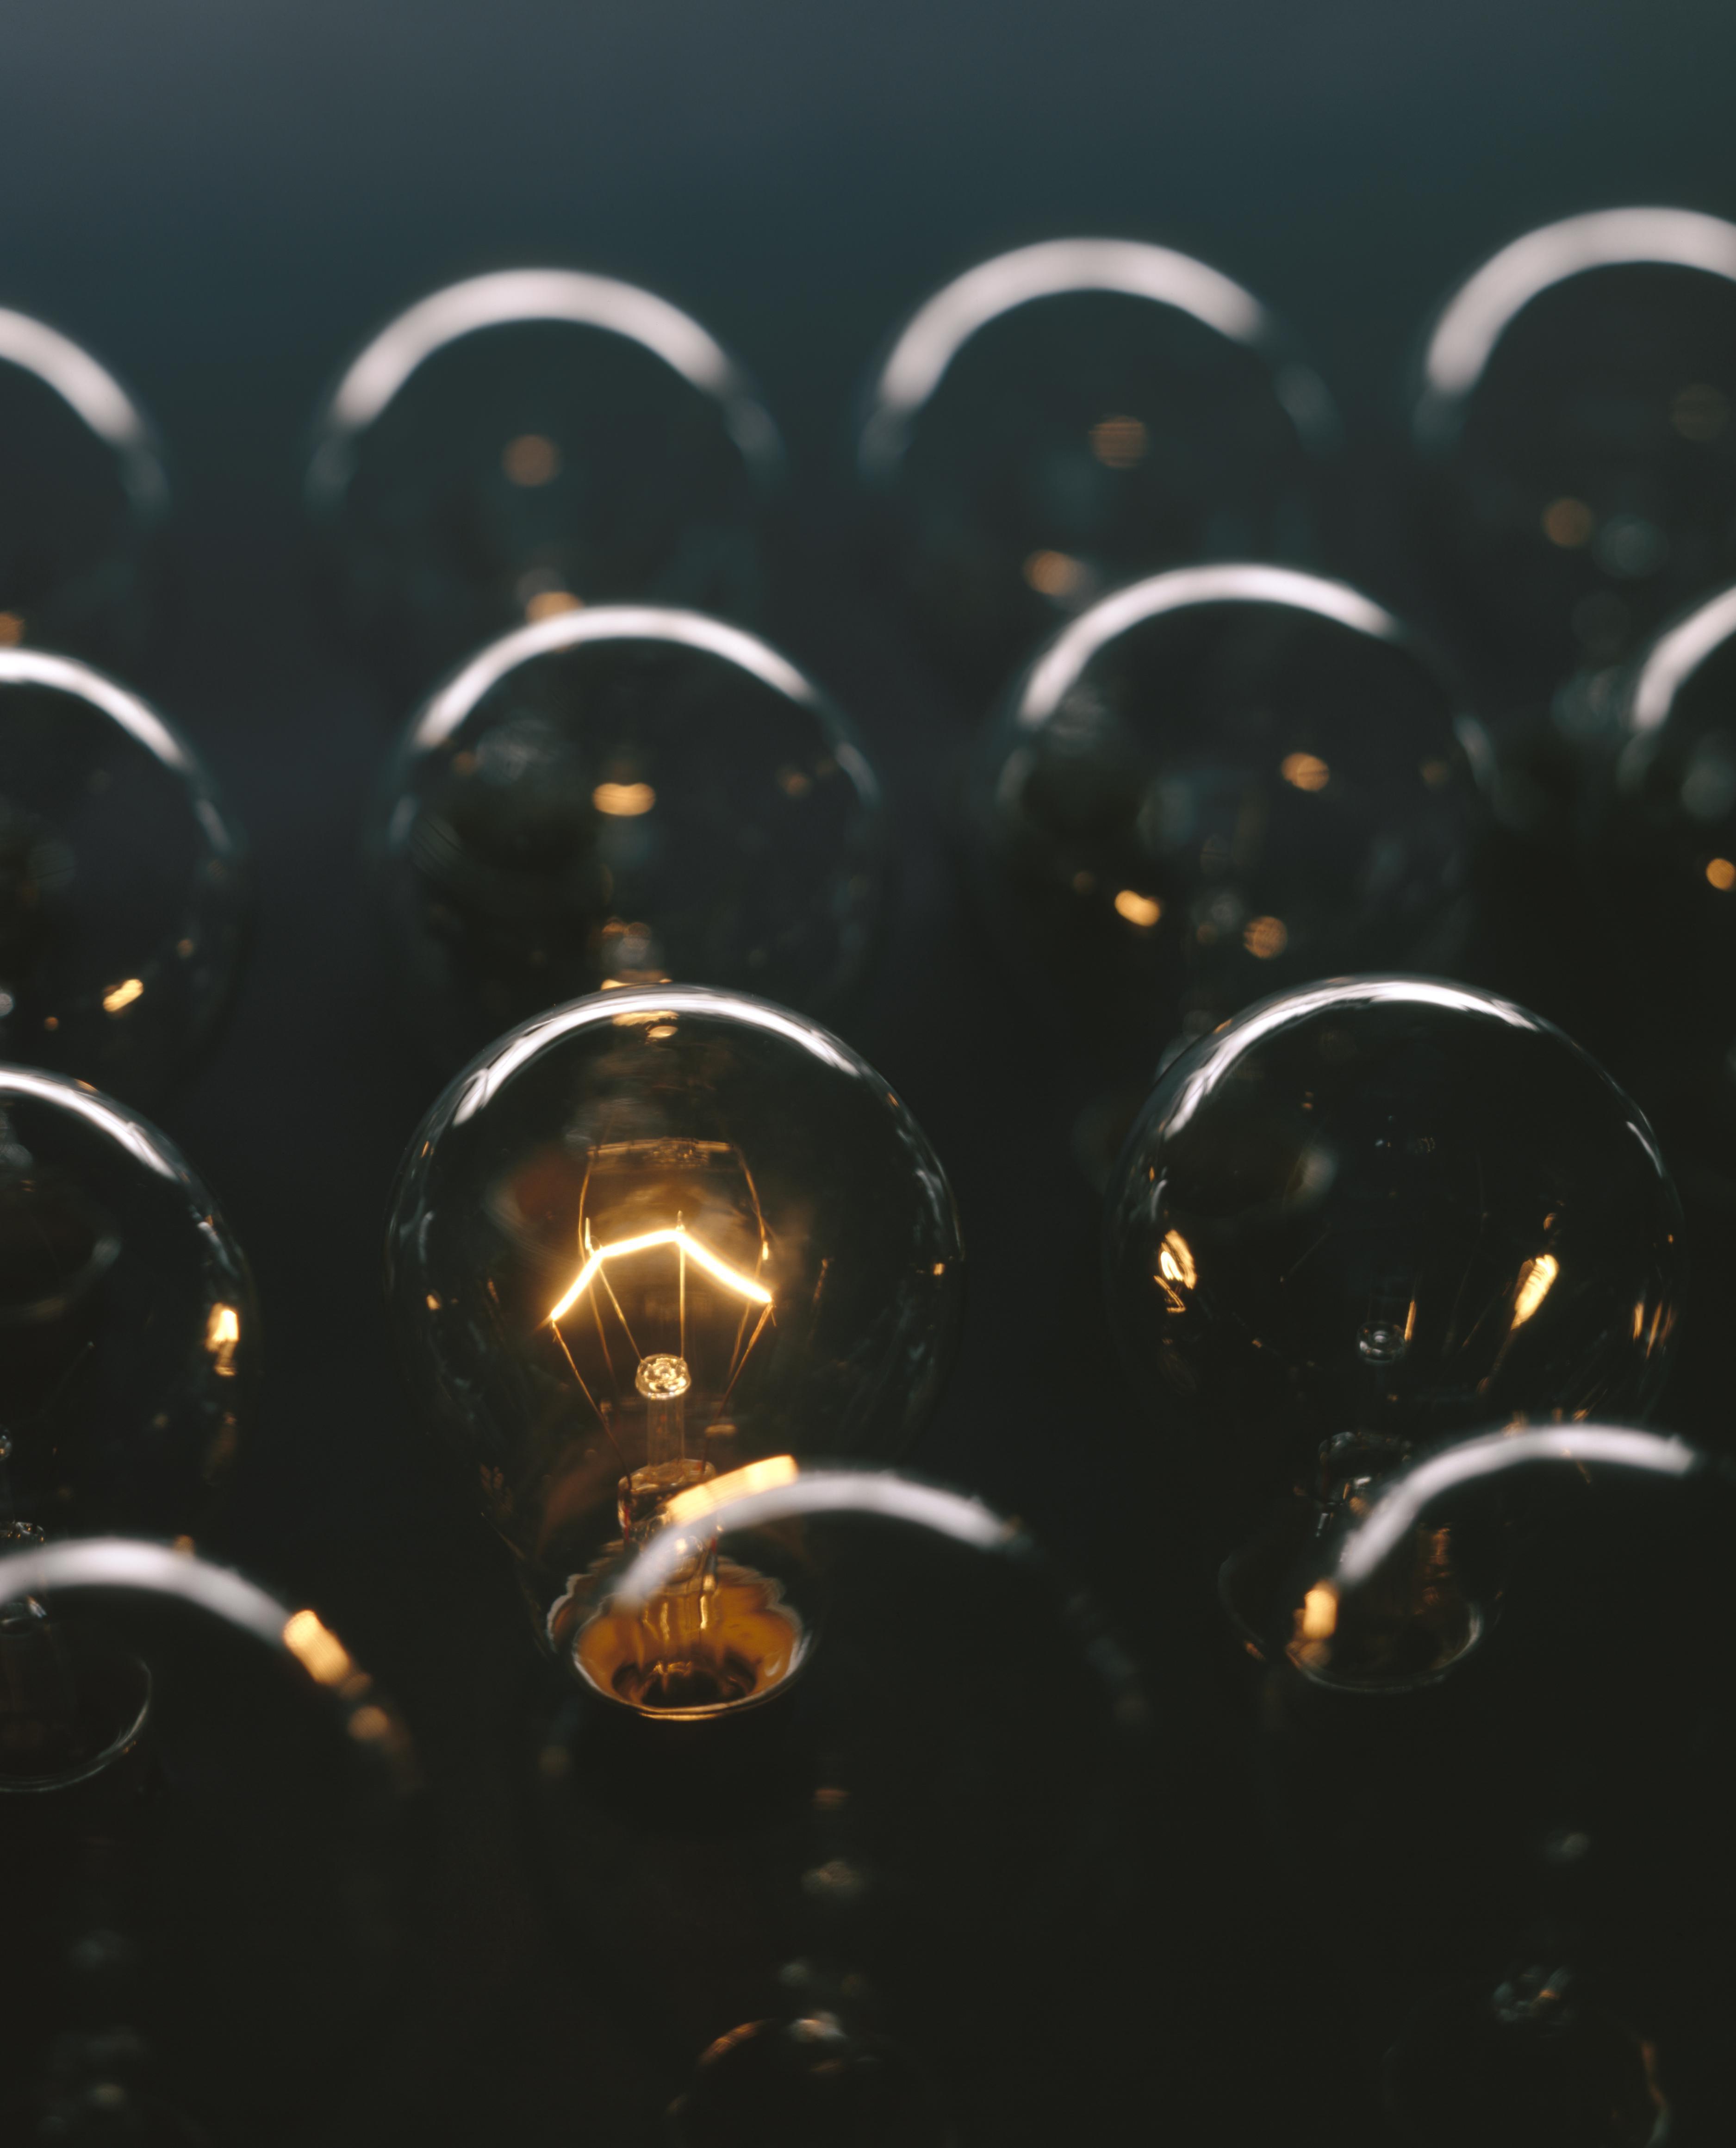 Glowing light bulb against dark background